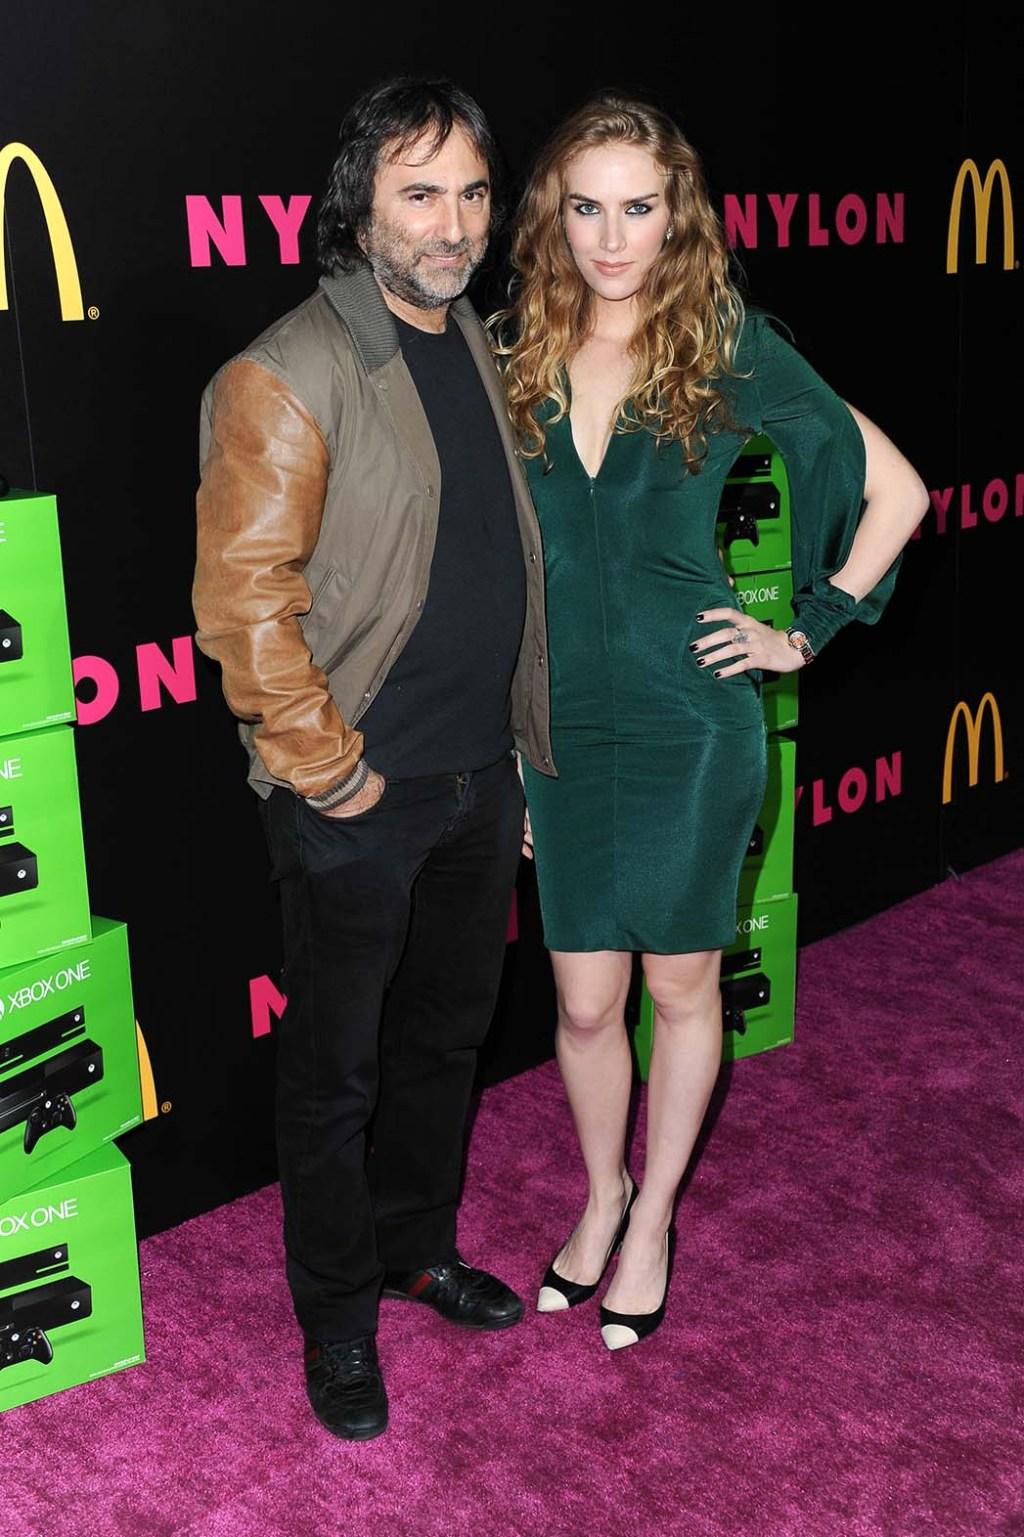 Joshua Newton and actress Charlotte Kirk